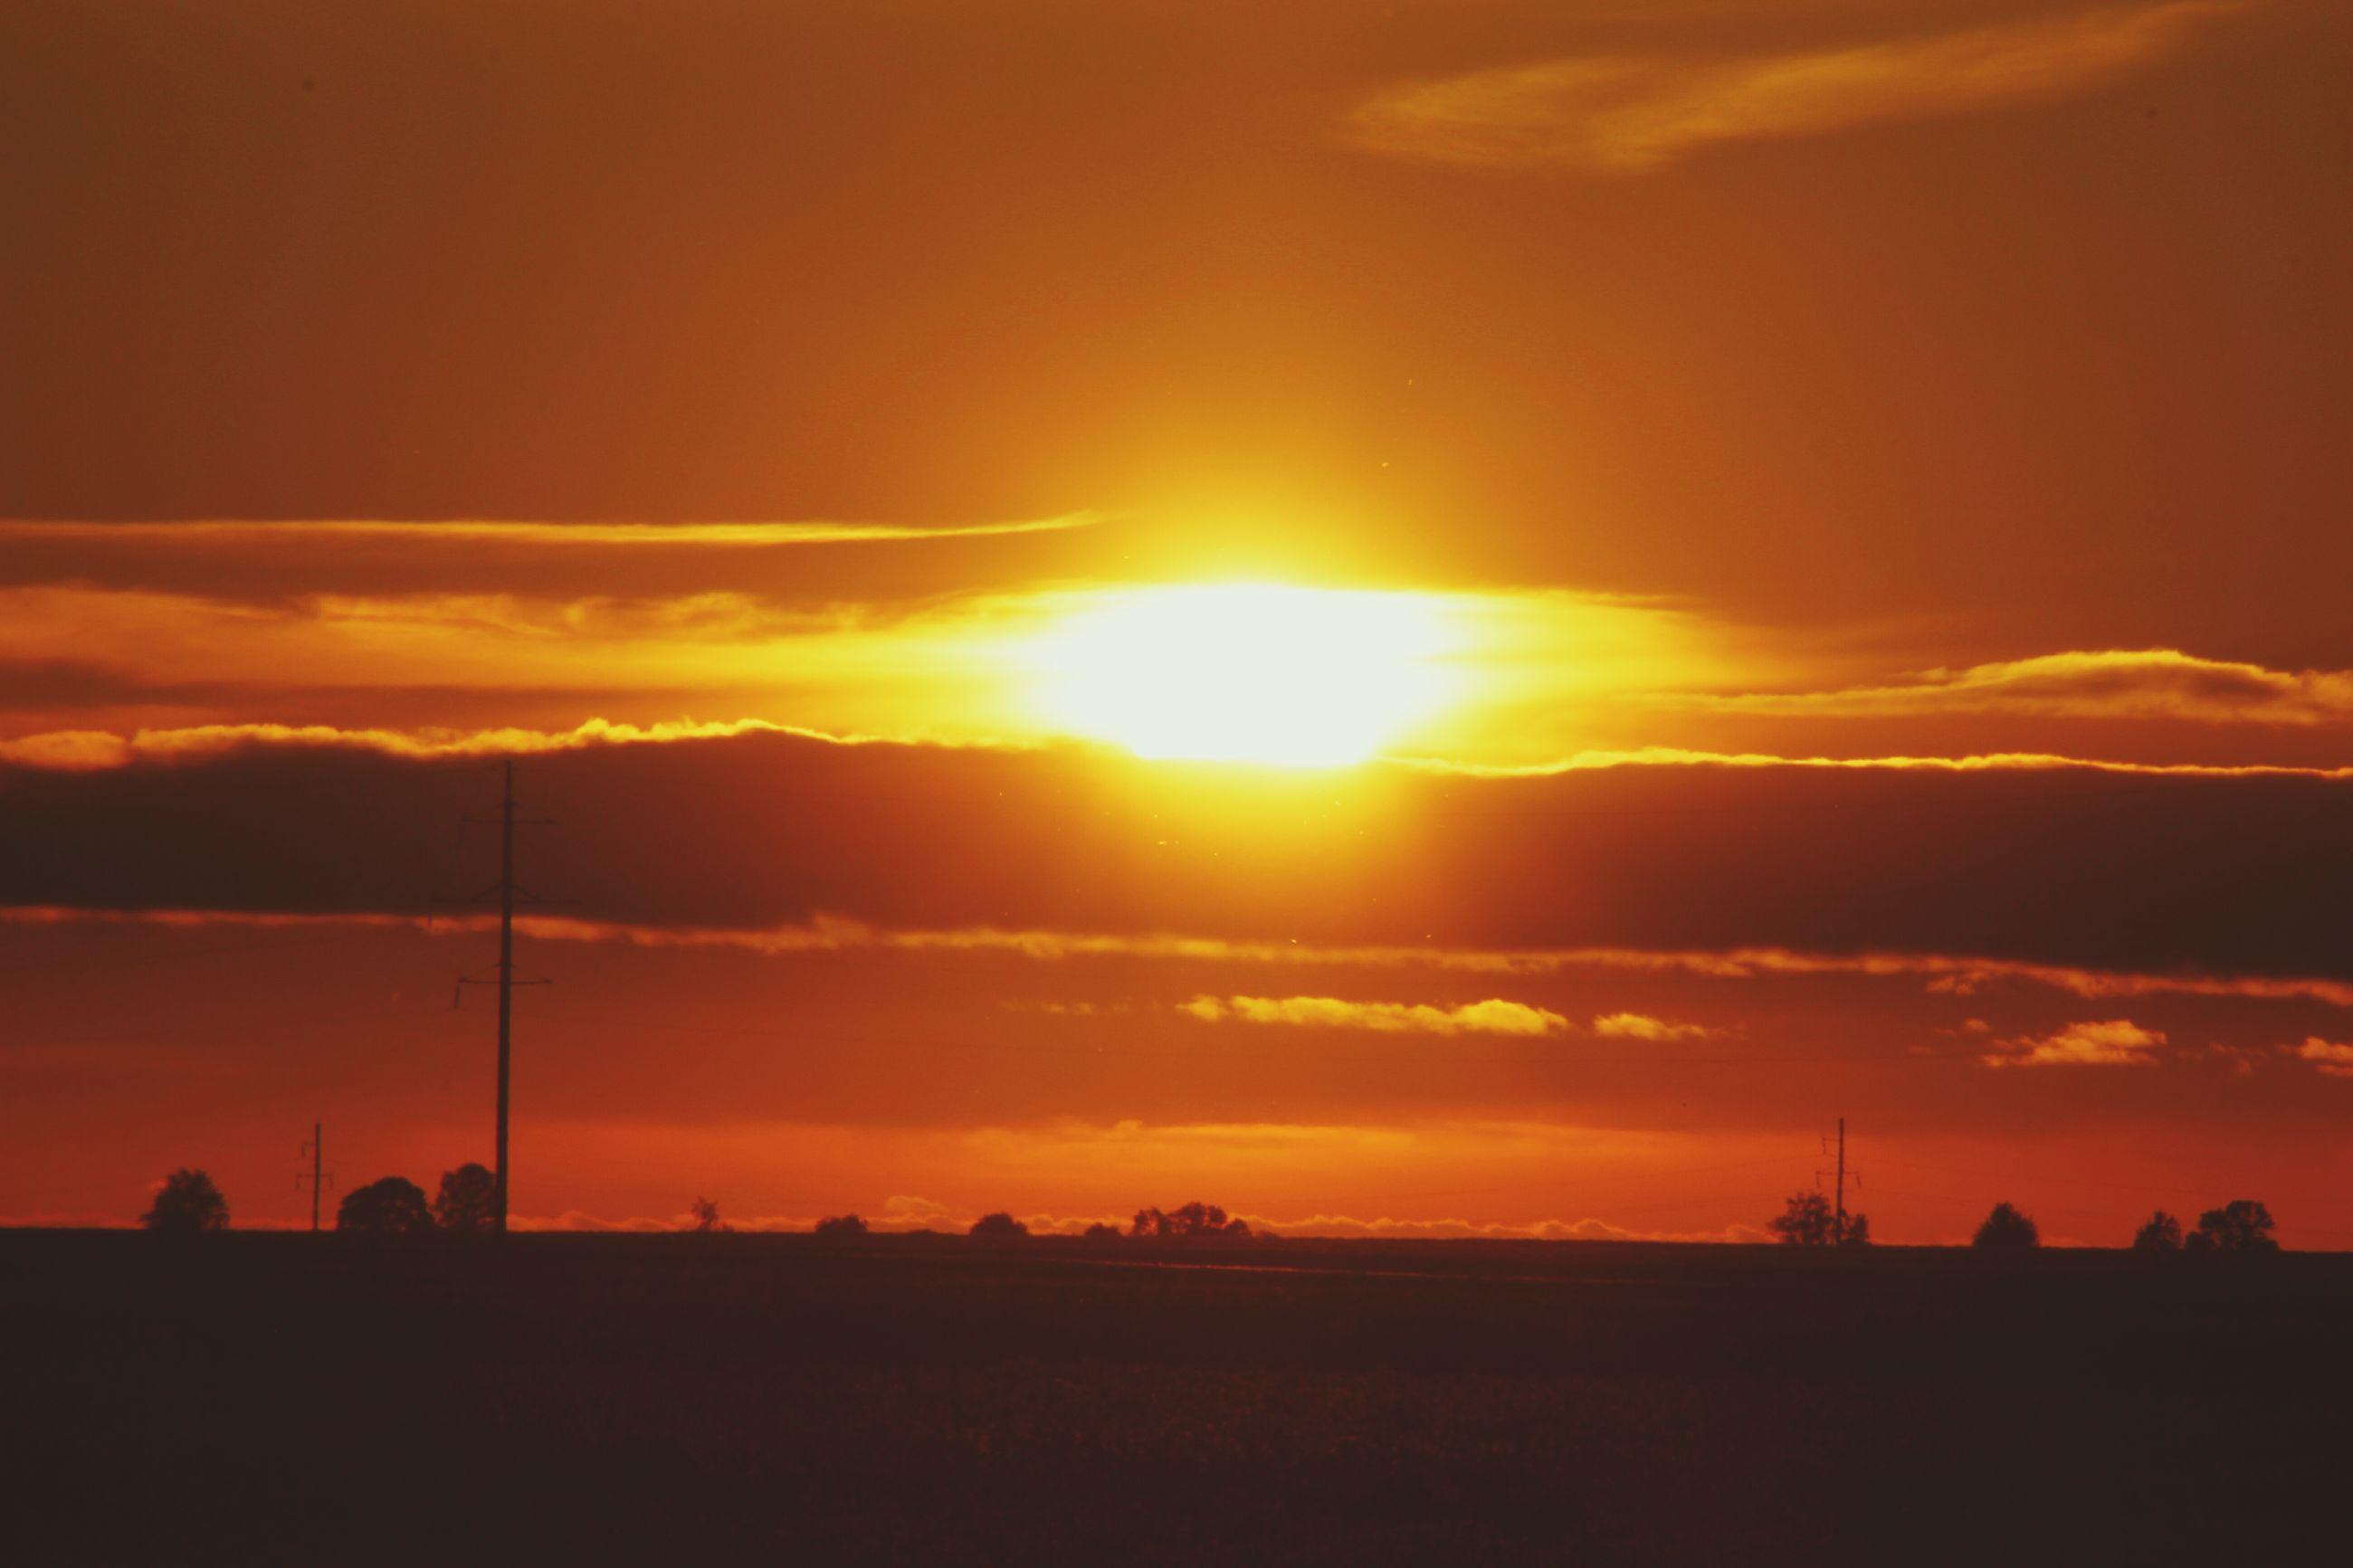 sunset, silhouette, orange color, sun, scenics, sky, beauty in nature, tranquil scene, tranquility, landscape, idyllic, nature, cloud - sky, cloud, dramatic sky, outdoors, no people, back lit, majestic, dark, sunbeam, outline, non-urban scene, remote, horizon over land